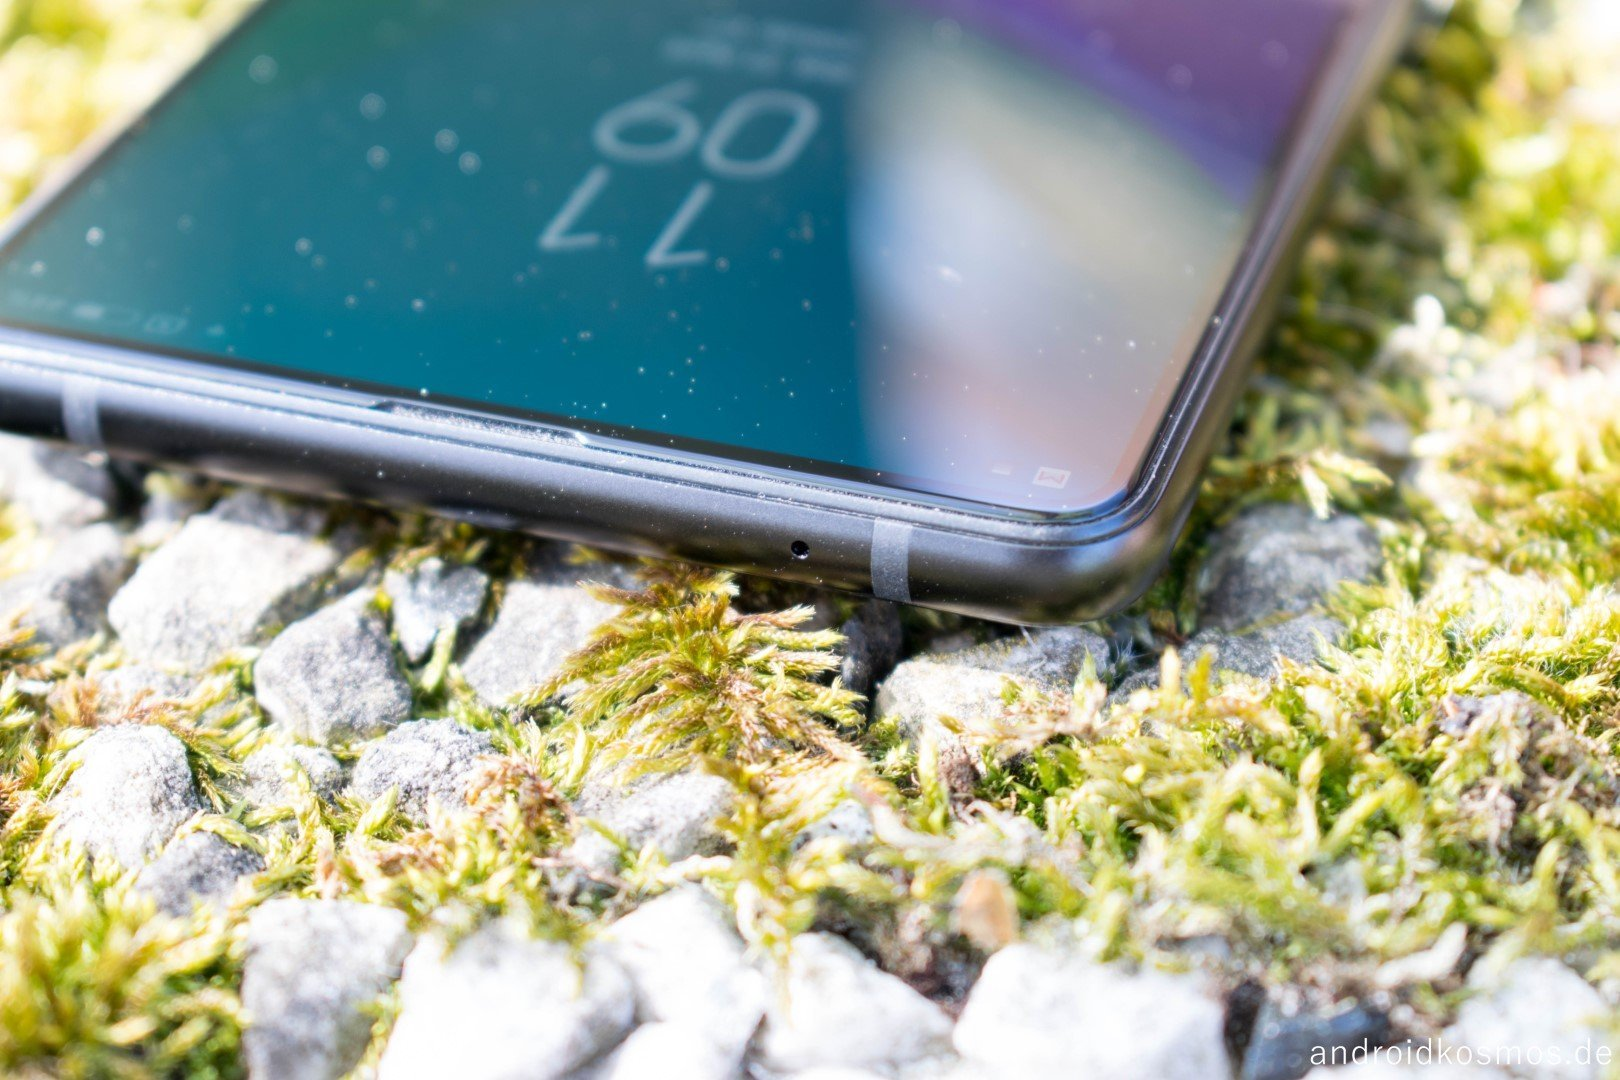 Androidkosmos.de Xiaomi Mi Mix 2s  60 von 71